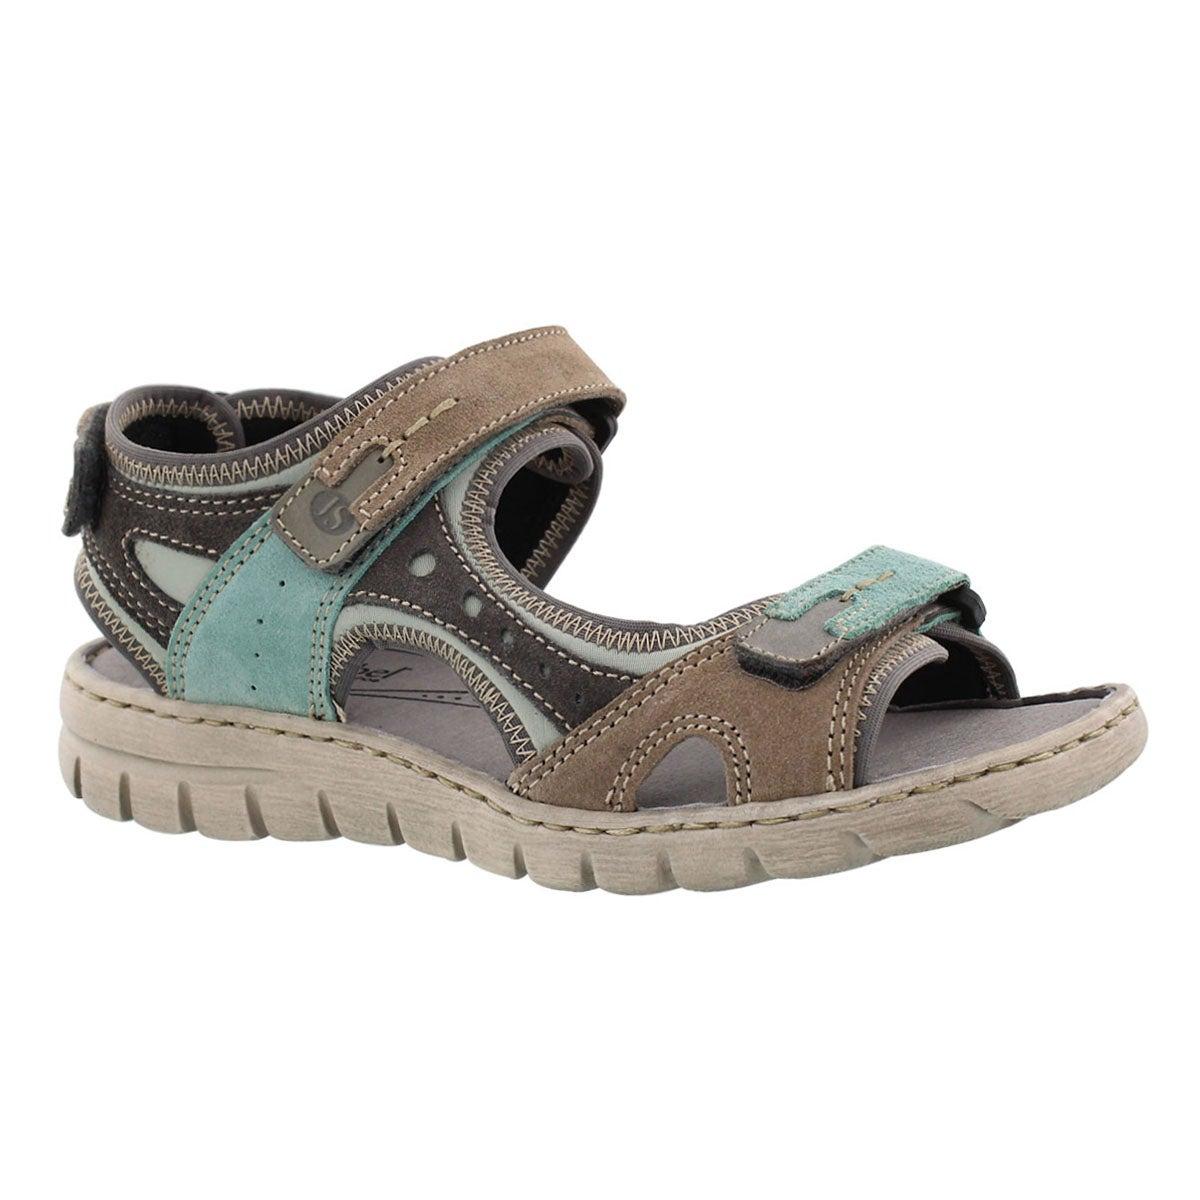 Women's STEFANIE 23 mint multi sport sandals